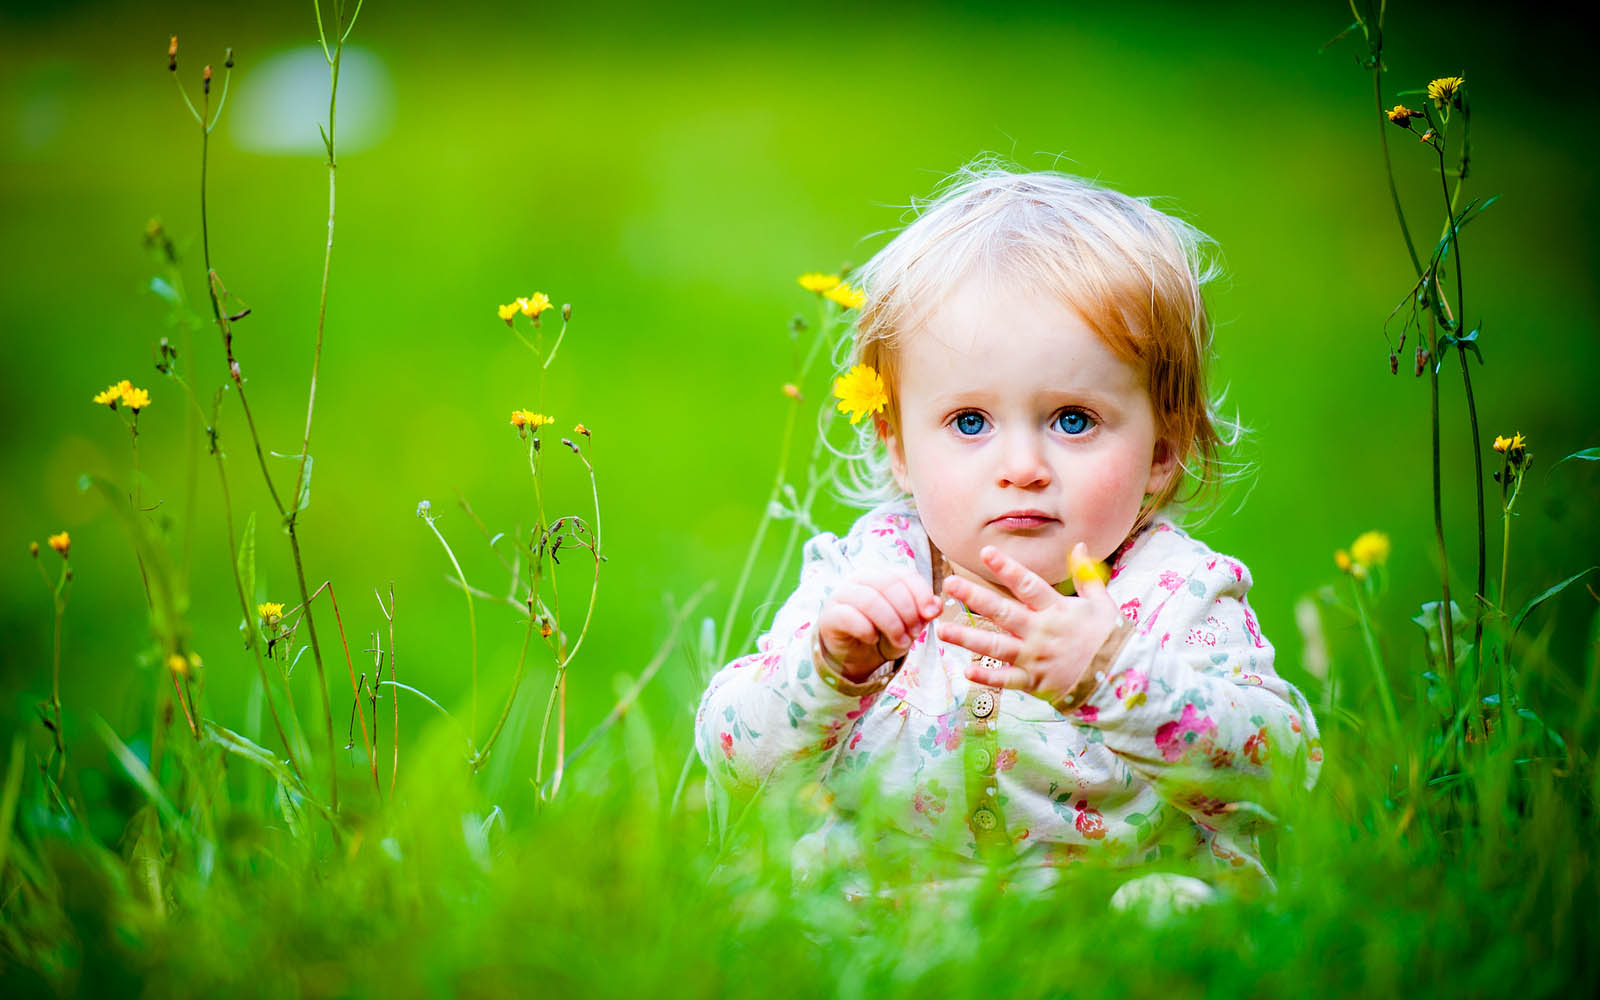 Baby Girl Wallpaperswallpapers screensavers 1600x1000